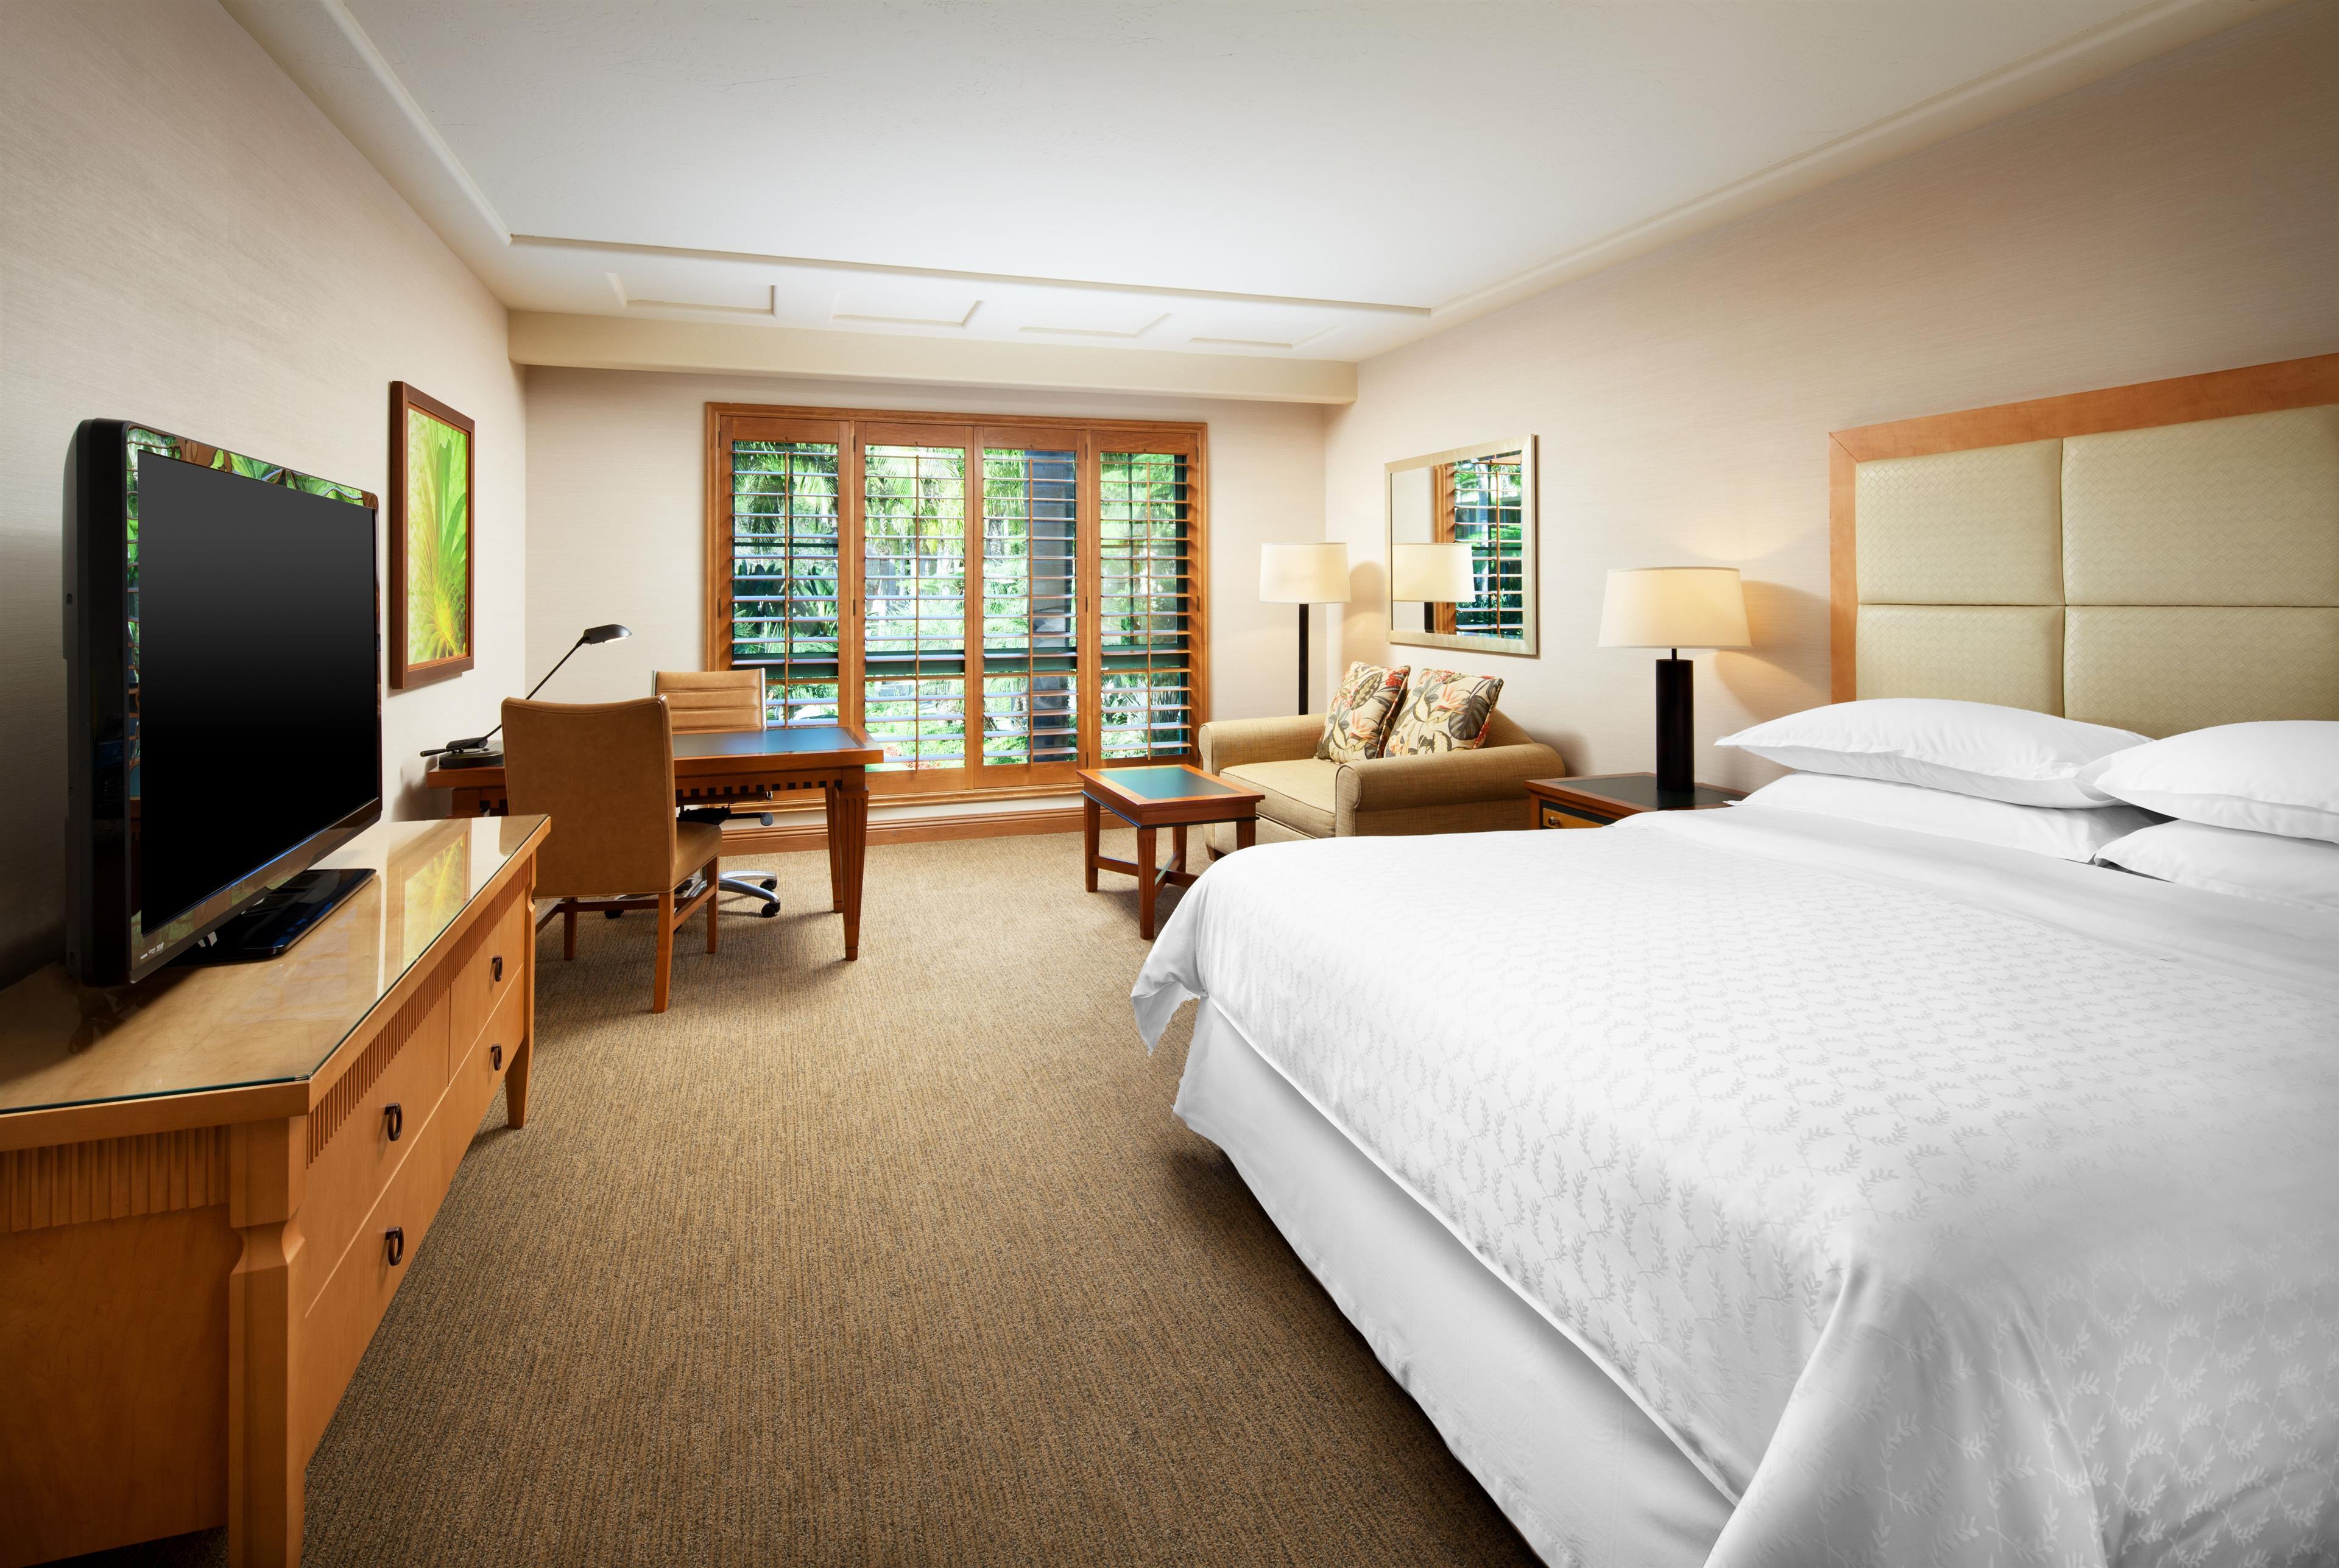 Sheraton La Jolla Hotel image 5